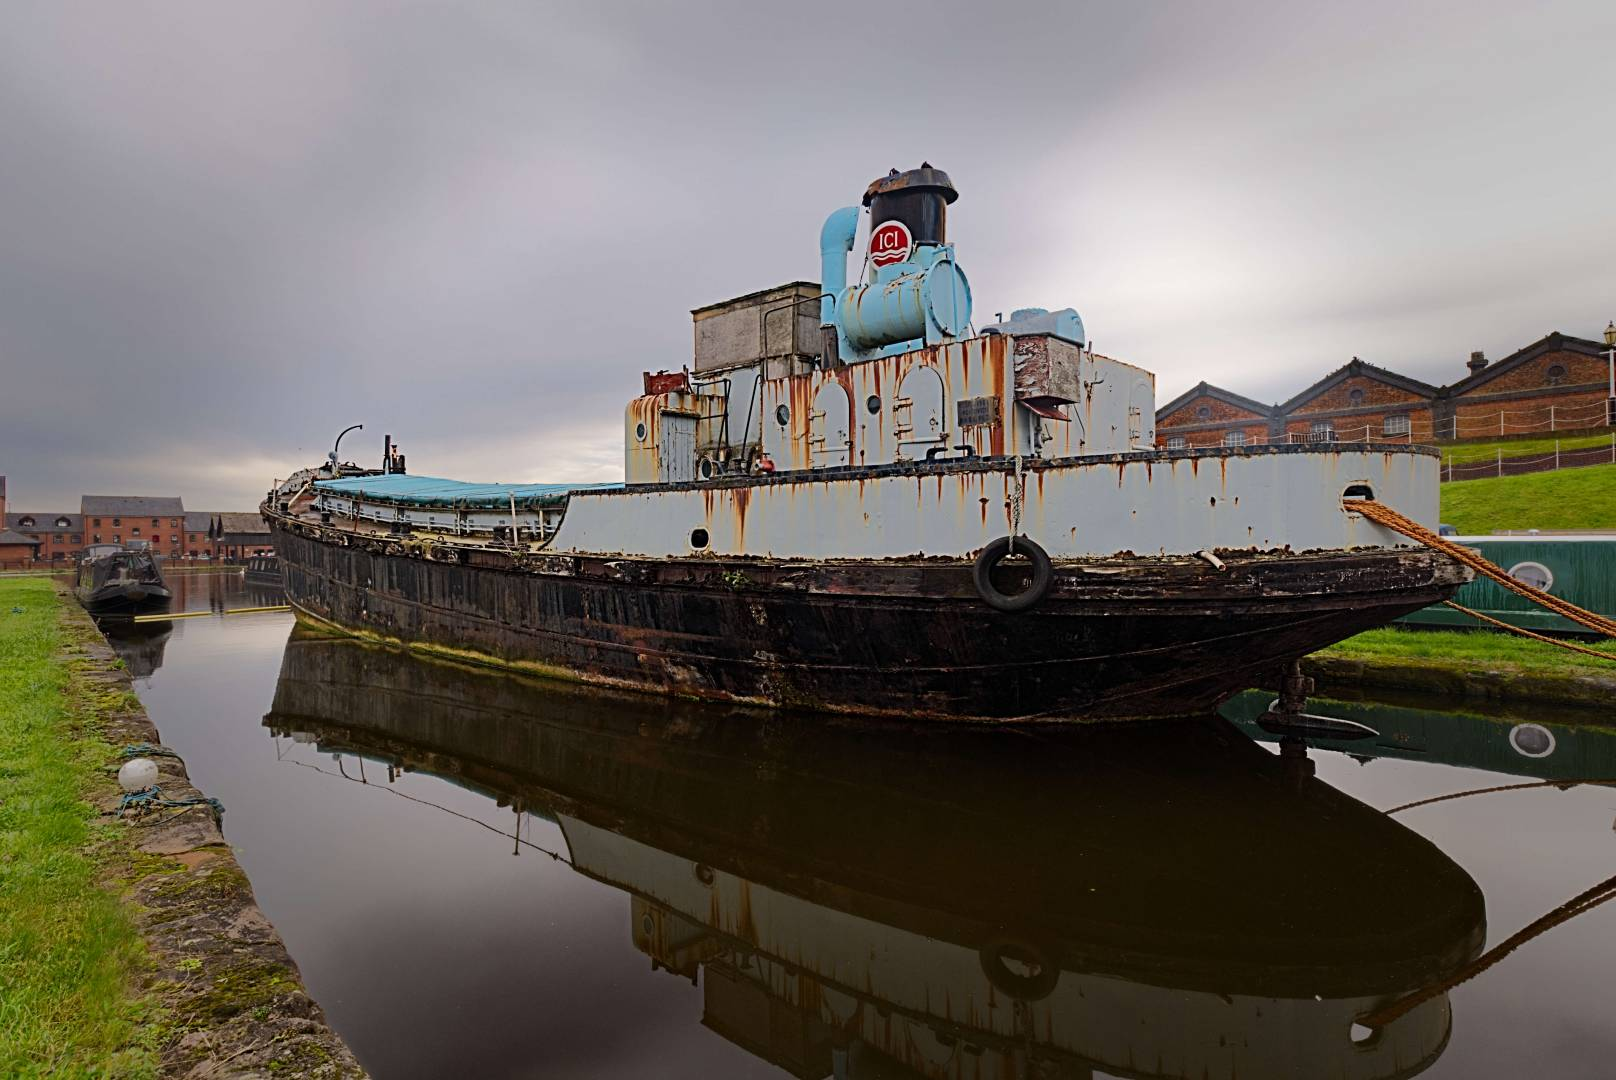 MV Cuddington, export of soda ash.  Fuji X-T20 with 10 - 24 f/4